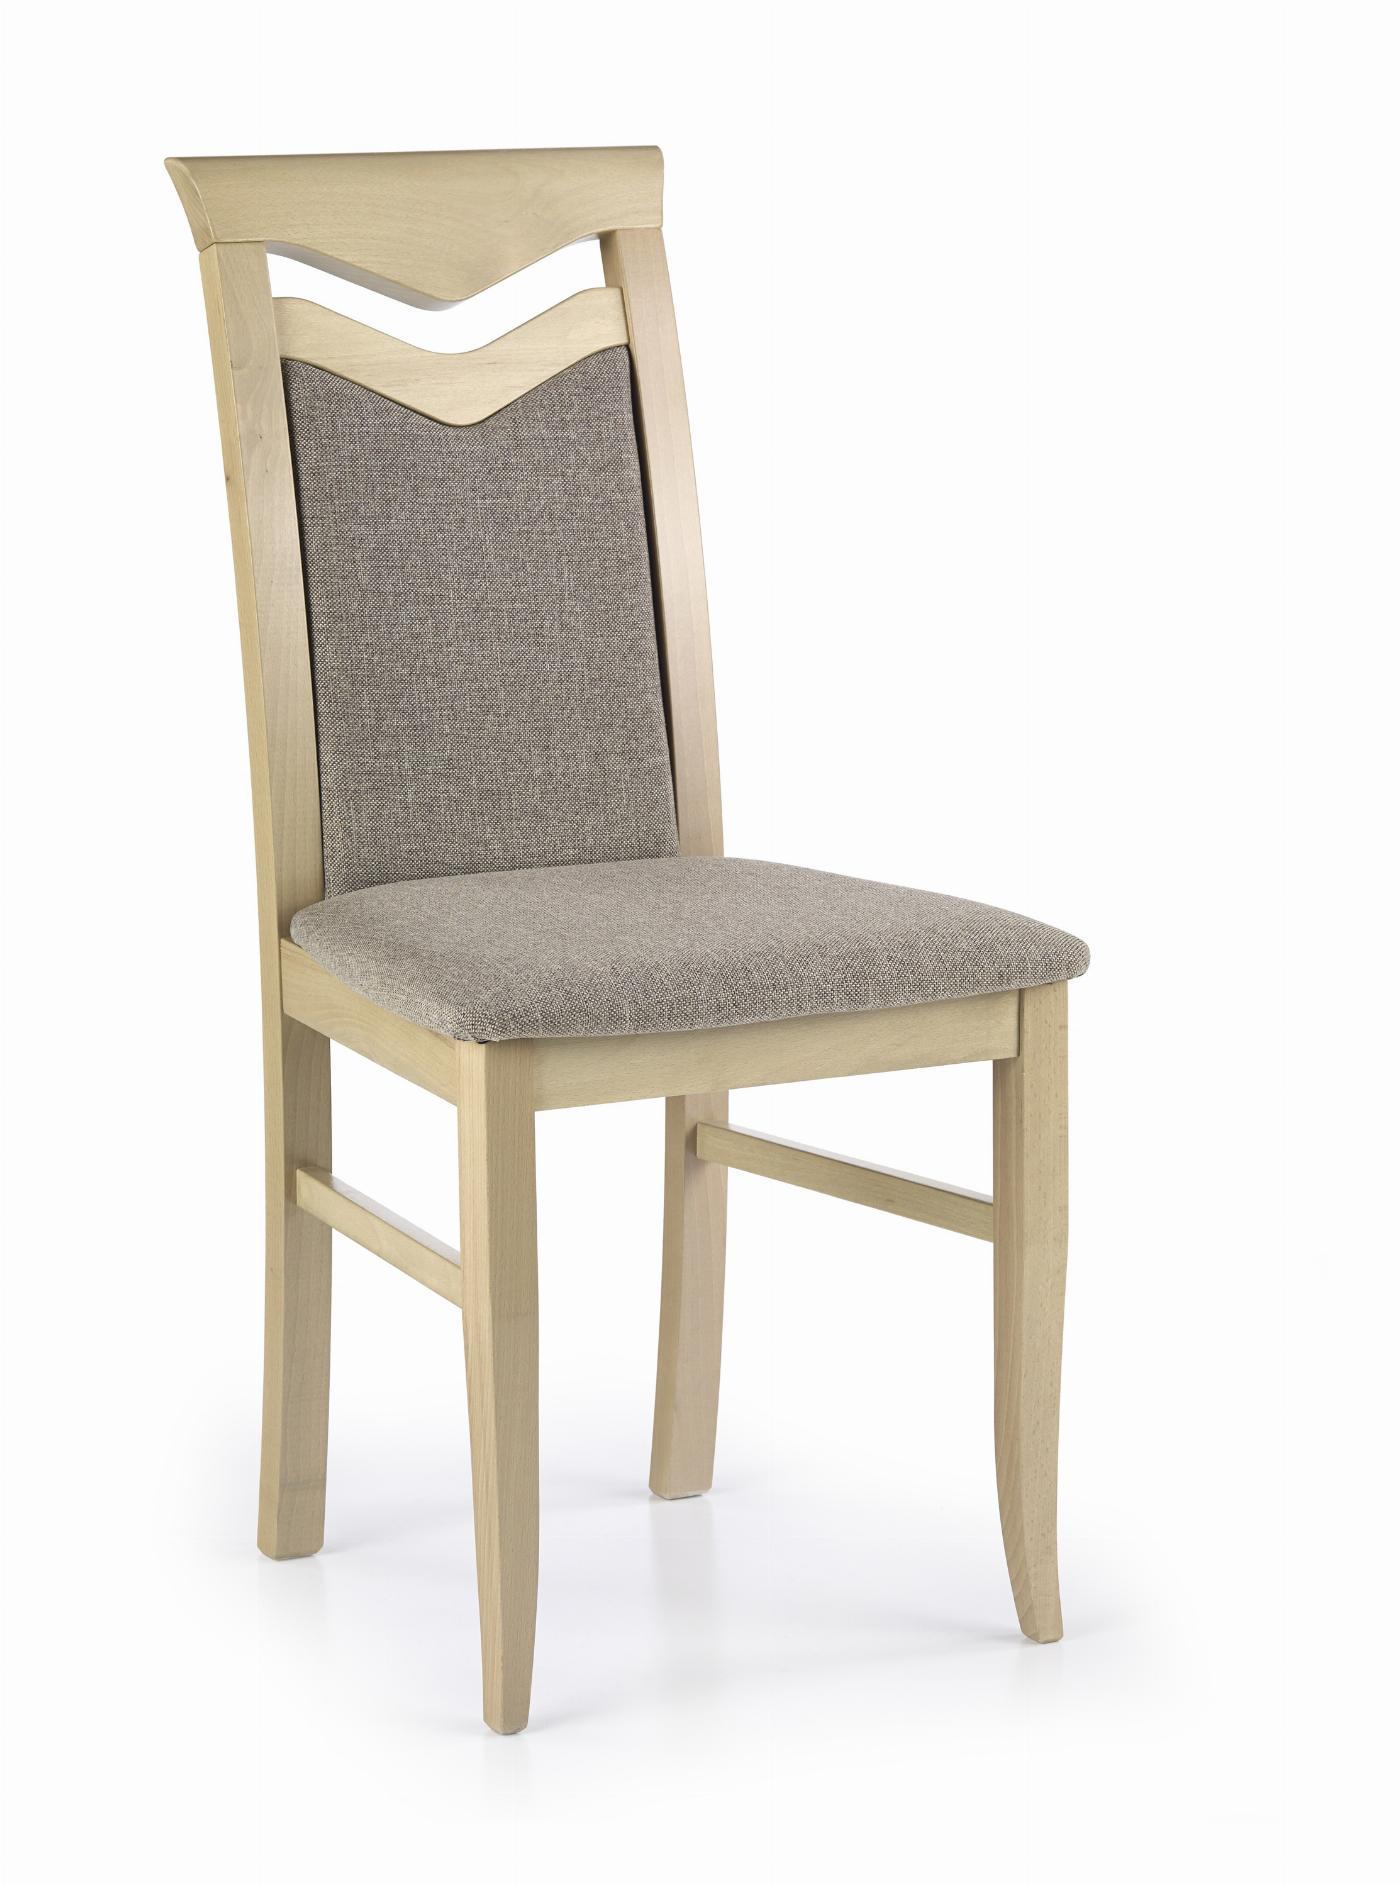 CITRONE krzesło dąb sonoma / tap: INARI 23 (1p=2szt)